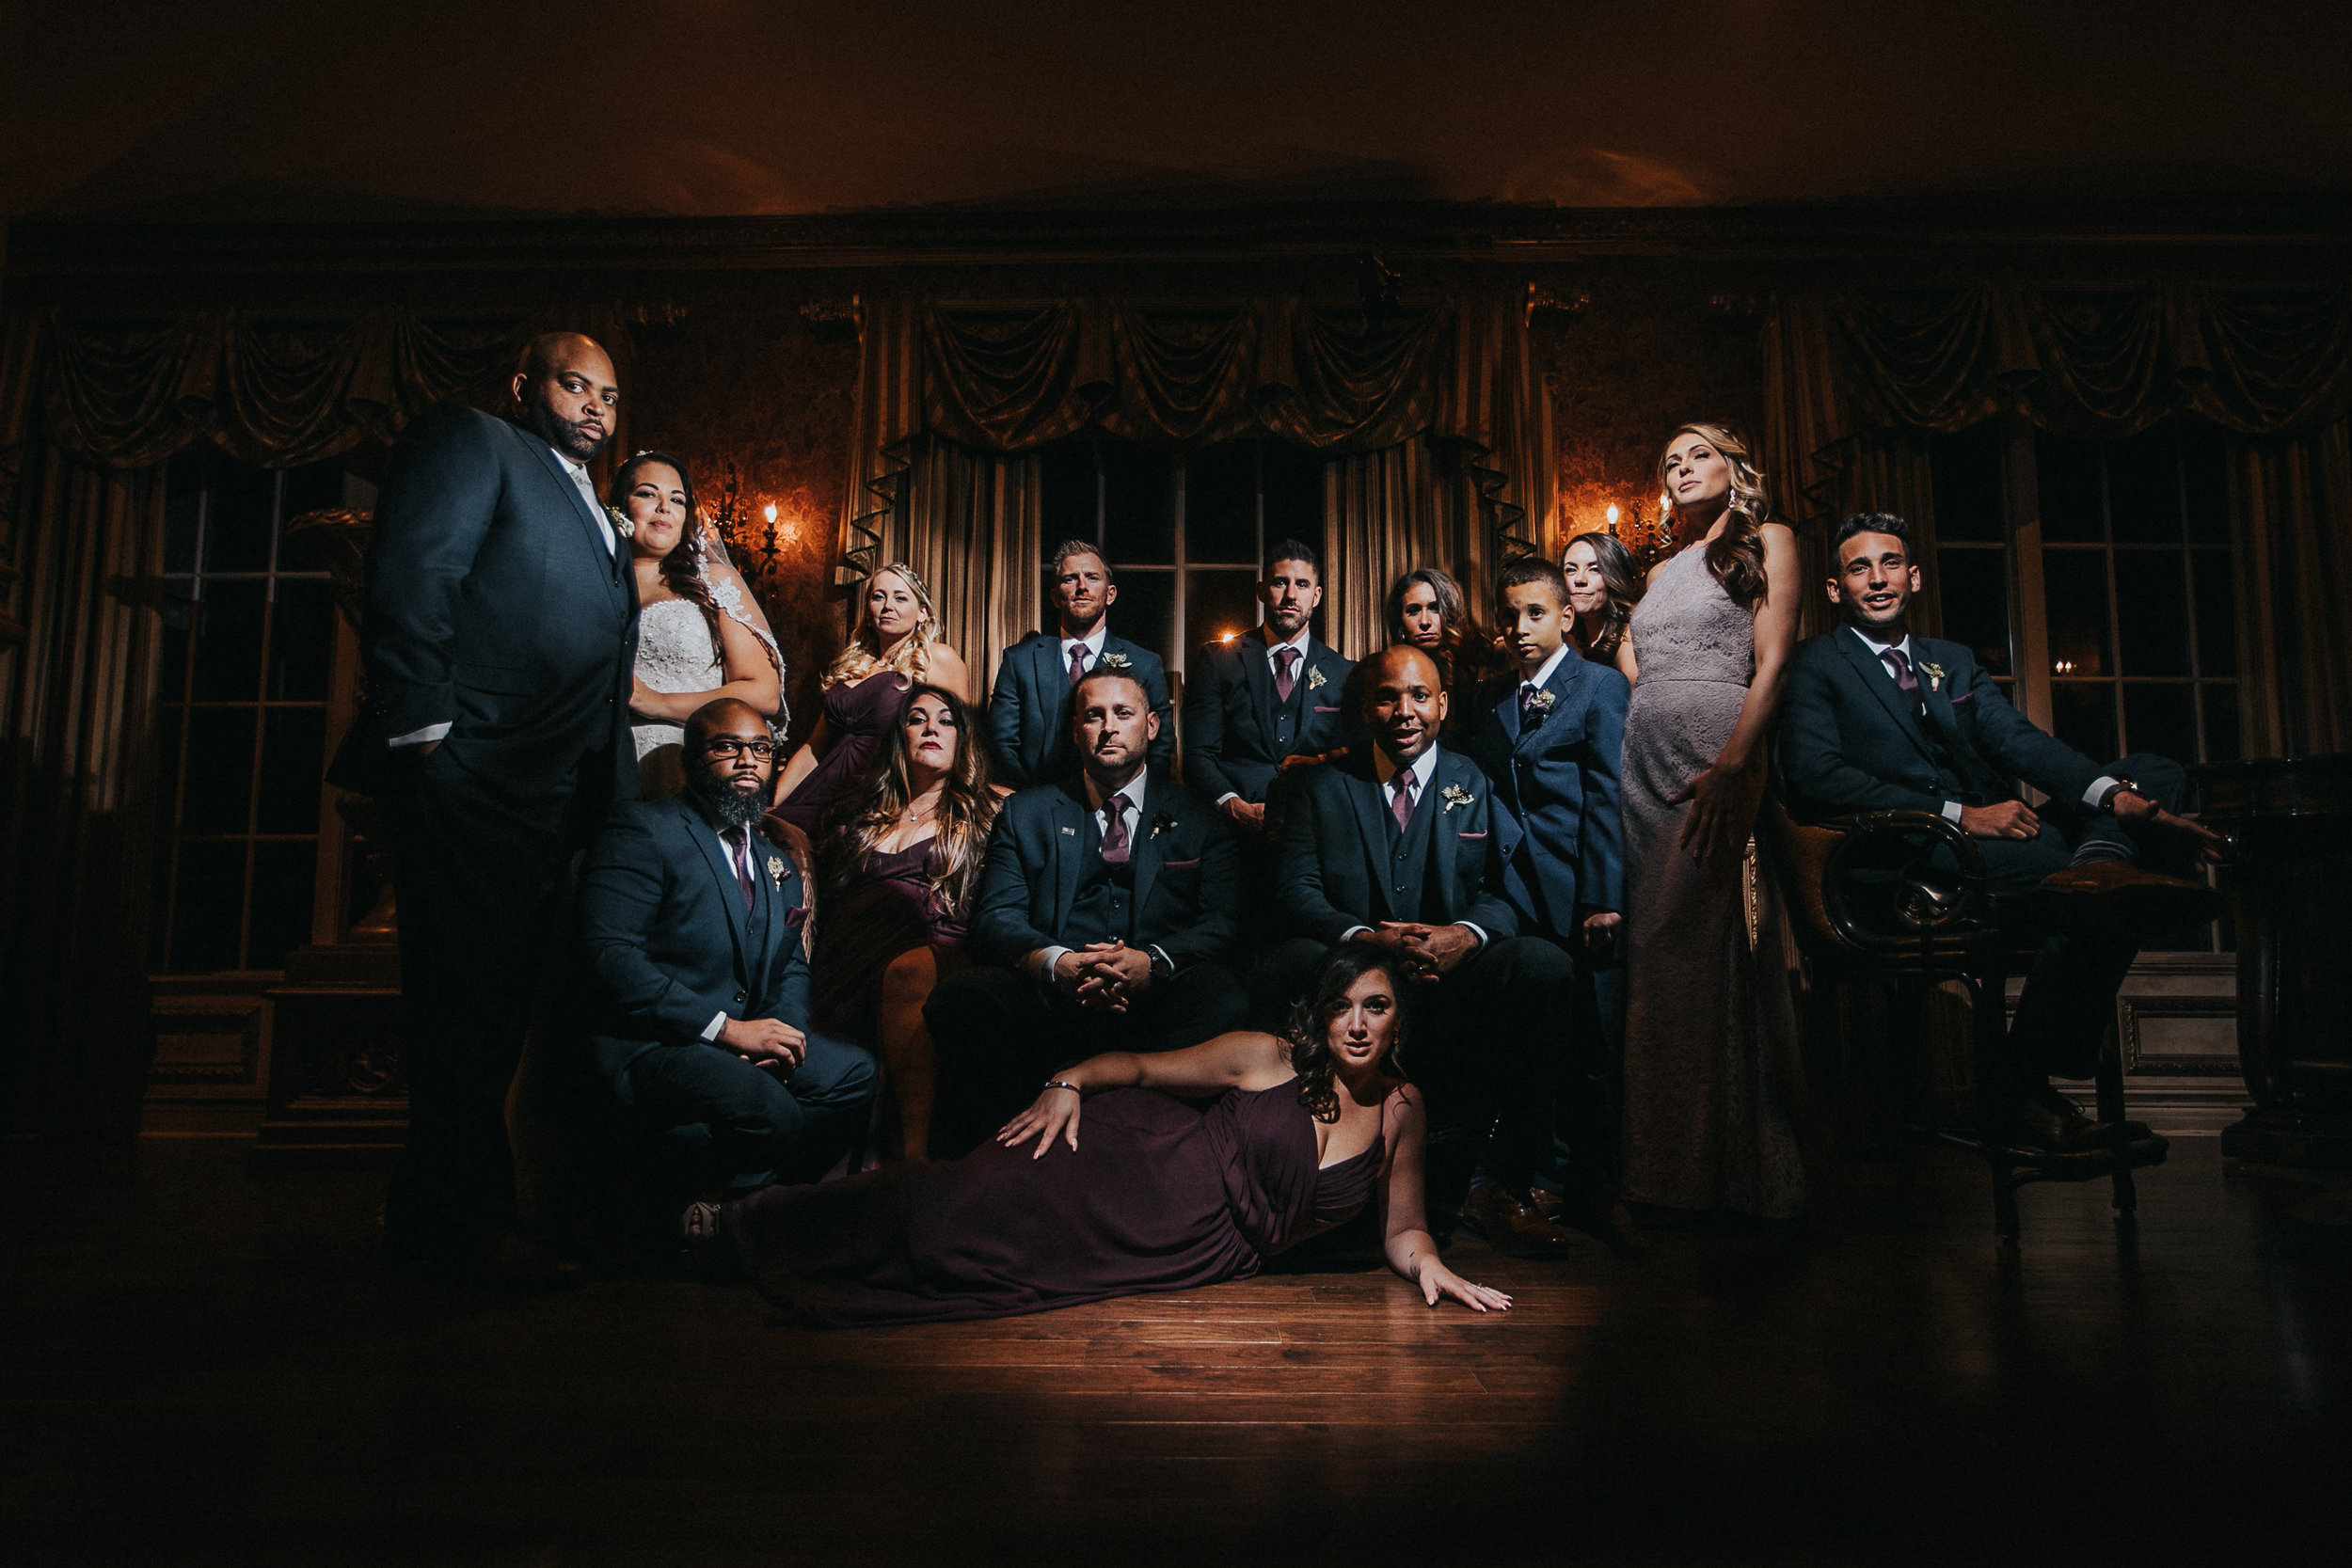 New-Jersey-Wedding-Photography-Brigalias-Deanna&Darryl-BridalParty-101.jpg